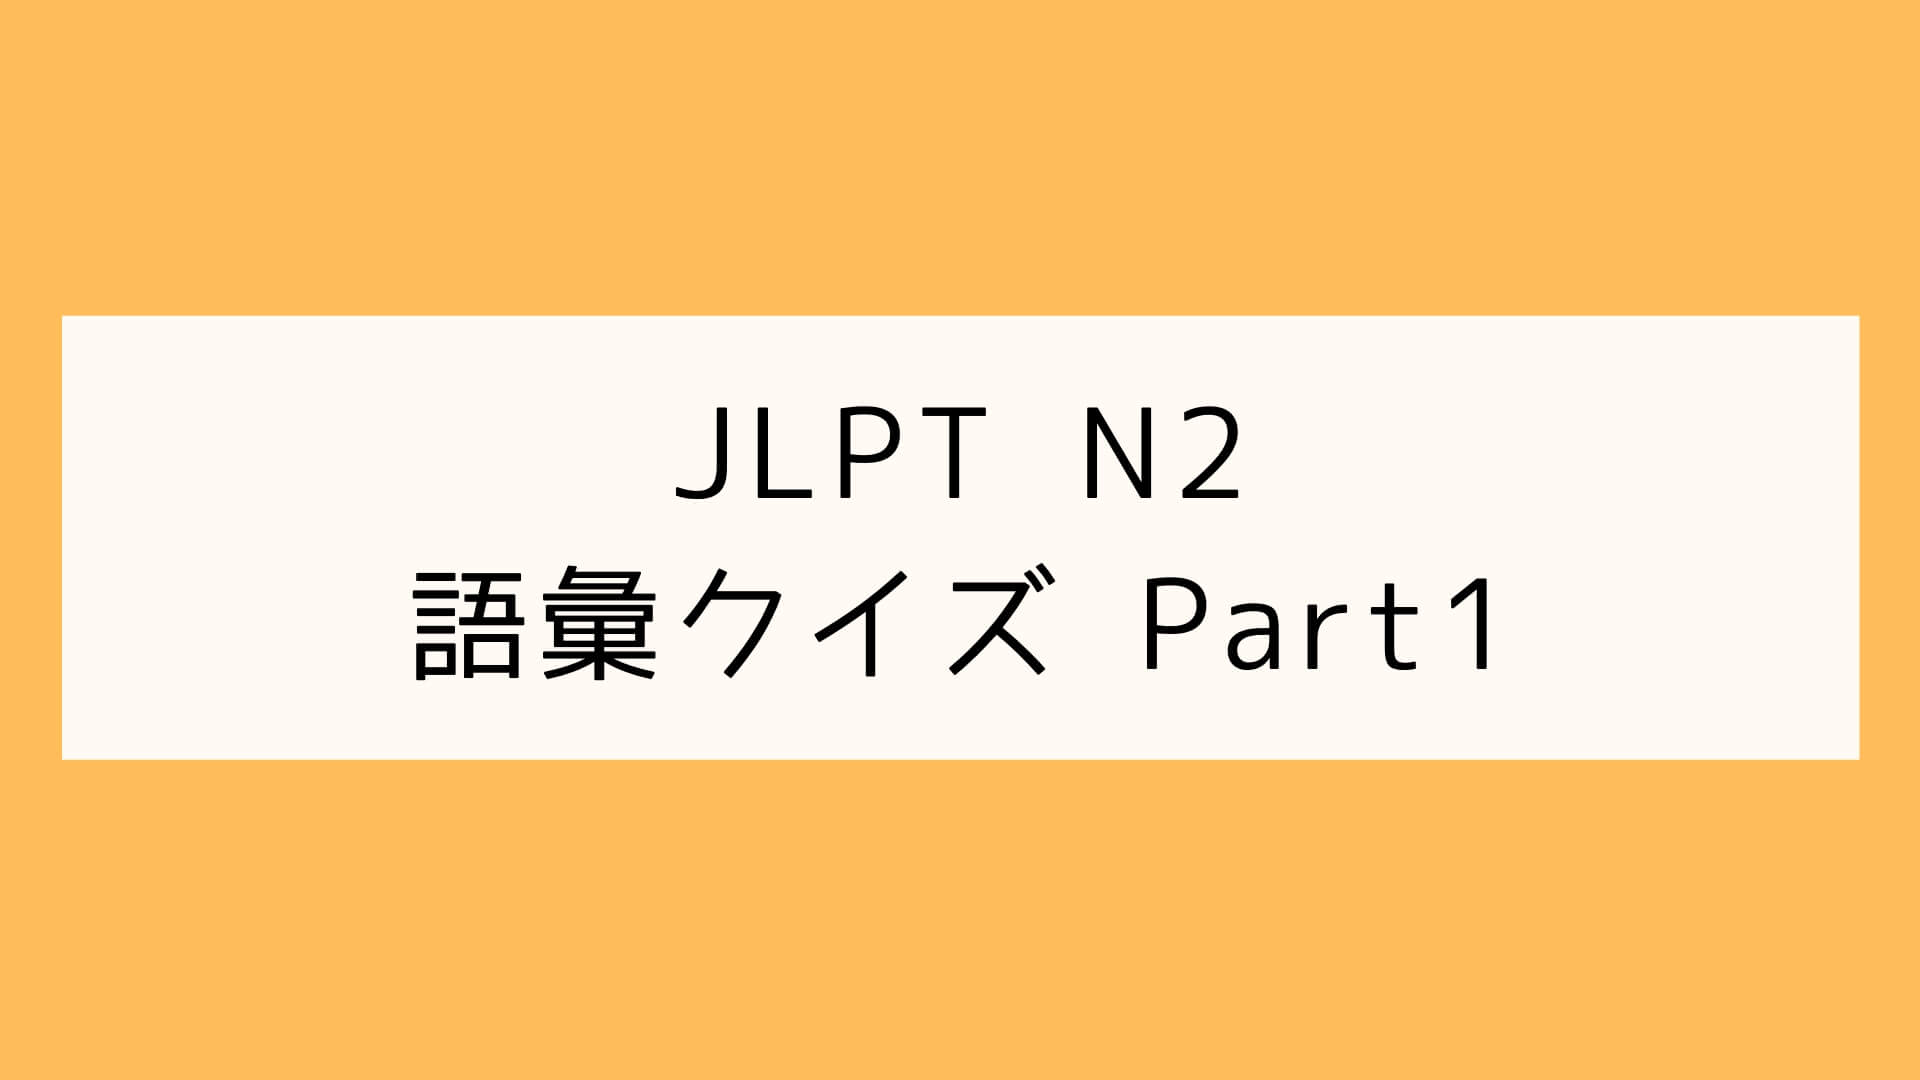 【JLPT N2】語彙クイズ Part1